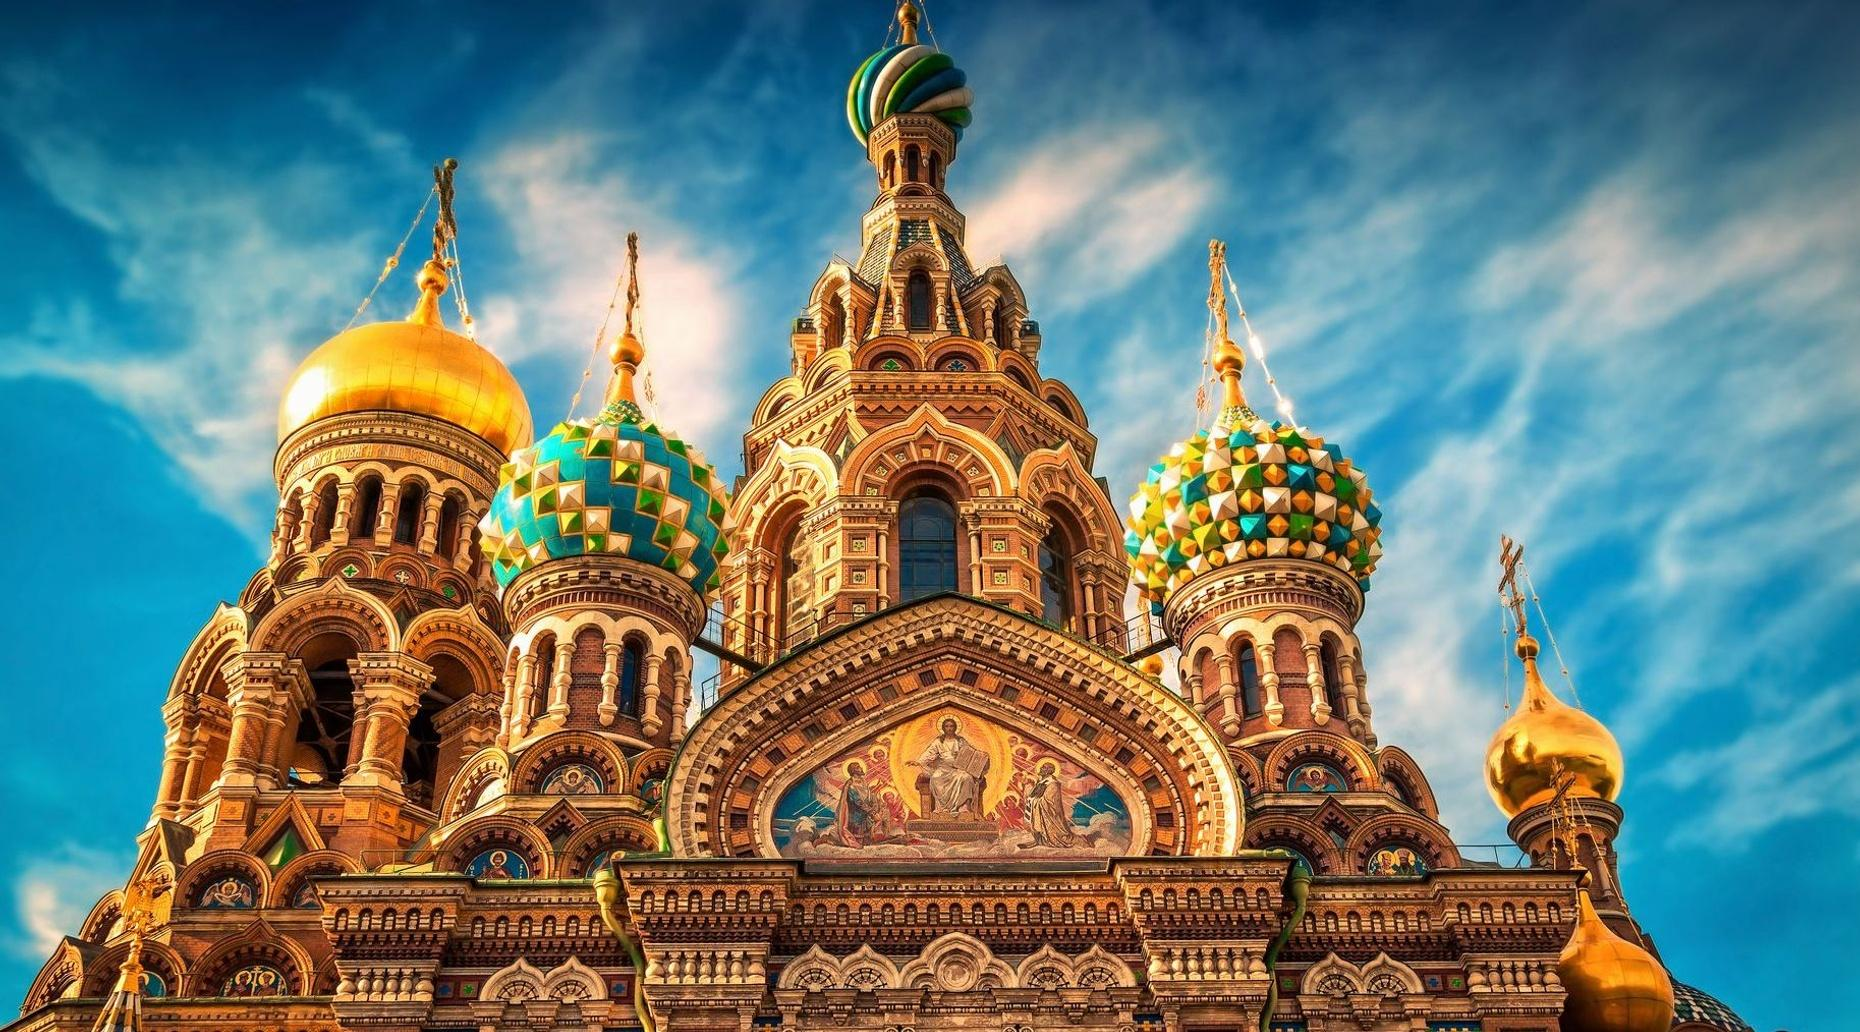 St Petersburg: 2-day Visa-free Shore Grand Tour